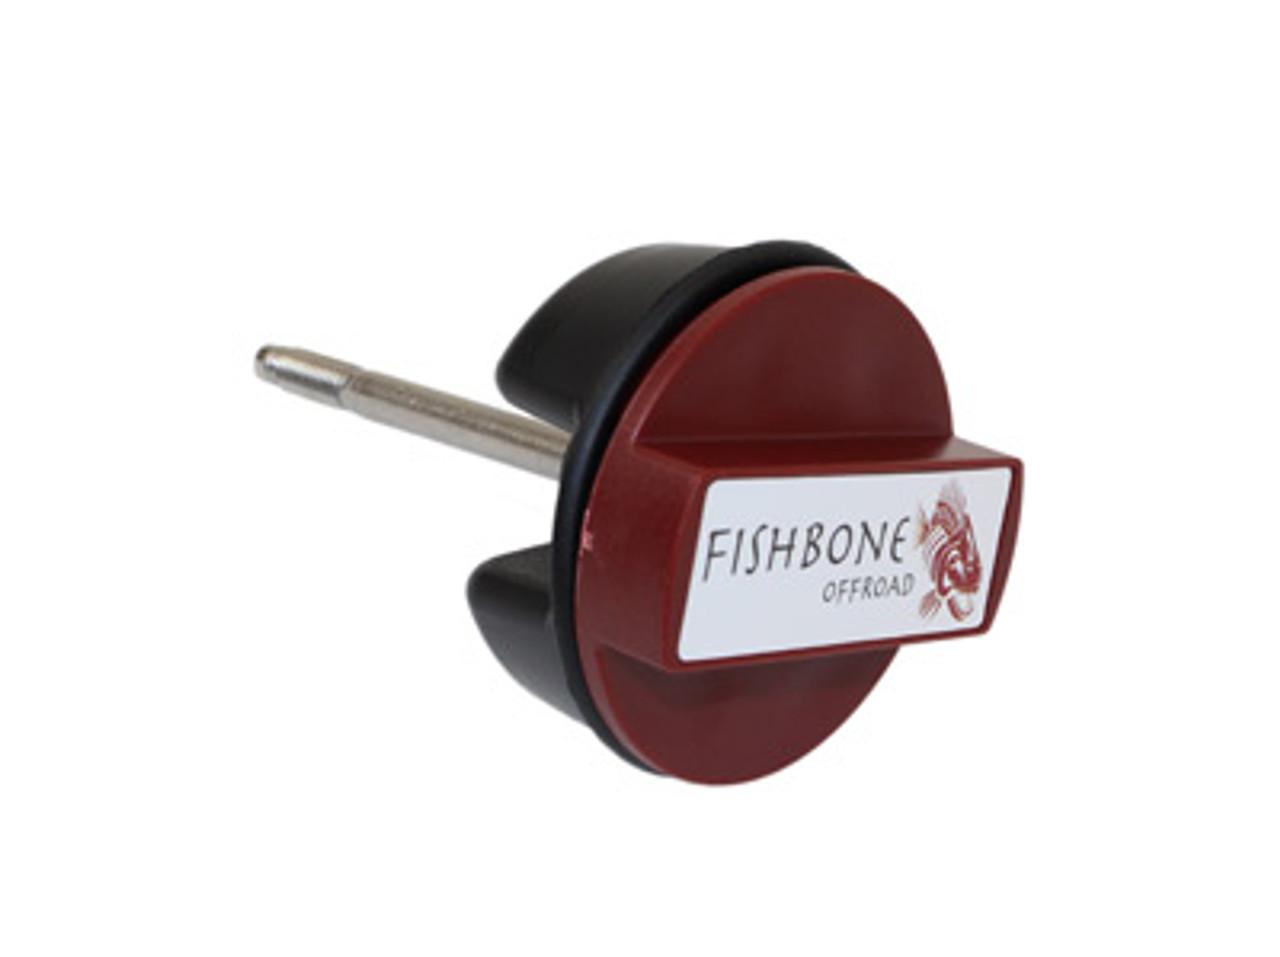 Fishbone Offroad FB1001 Hardtop Key for Jeep Wrangler JK 2007-2018